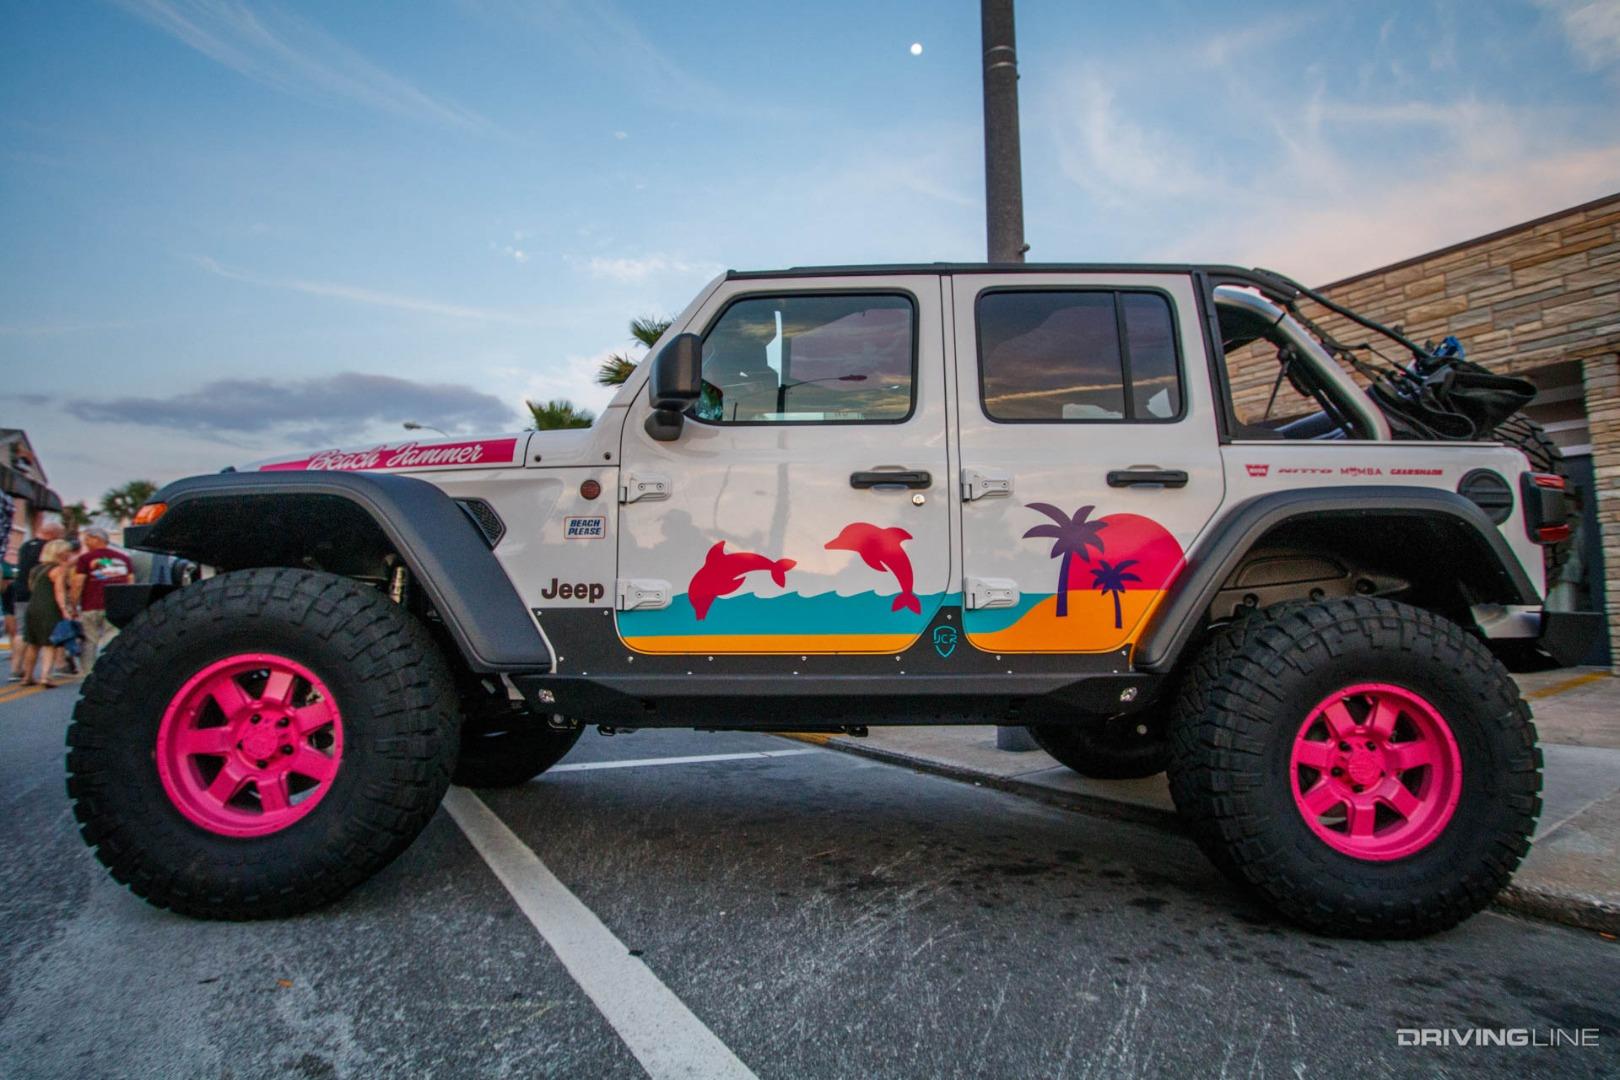 Jeep Wrangler Diesel >> Jeep Beach 2018 [Gallery] | DrivingLine